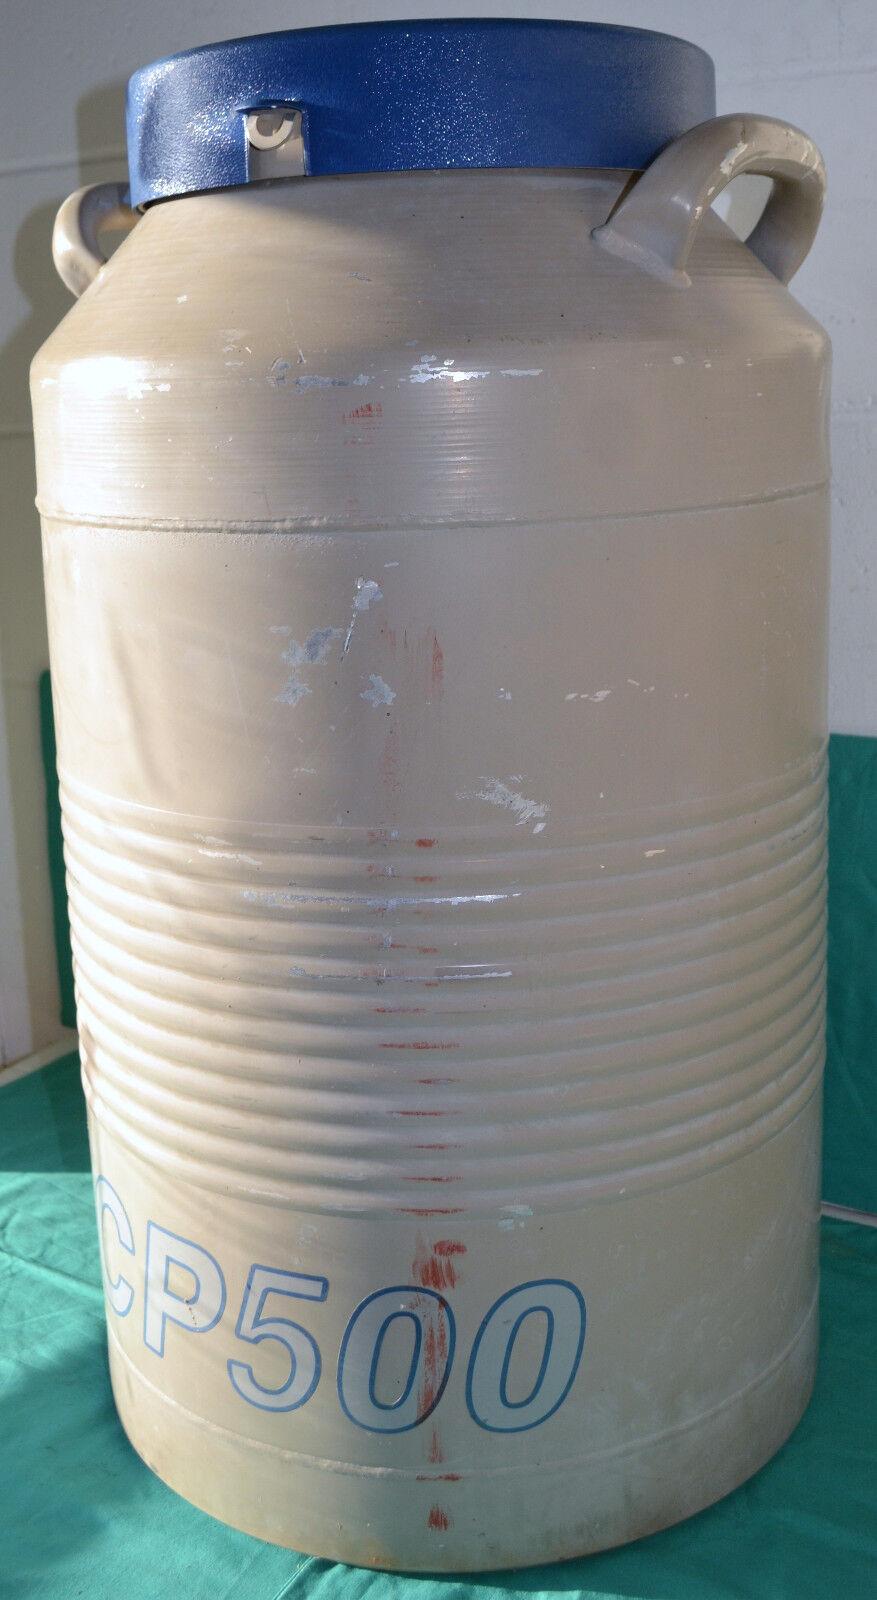 Taylor wharton cp500 cryogenic storage tank cad for Wharton cad